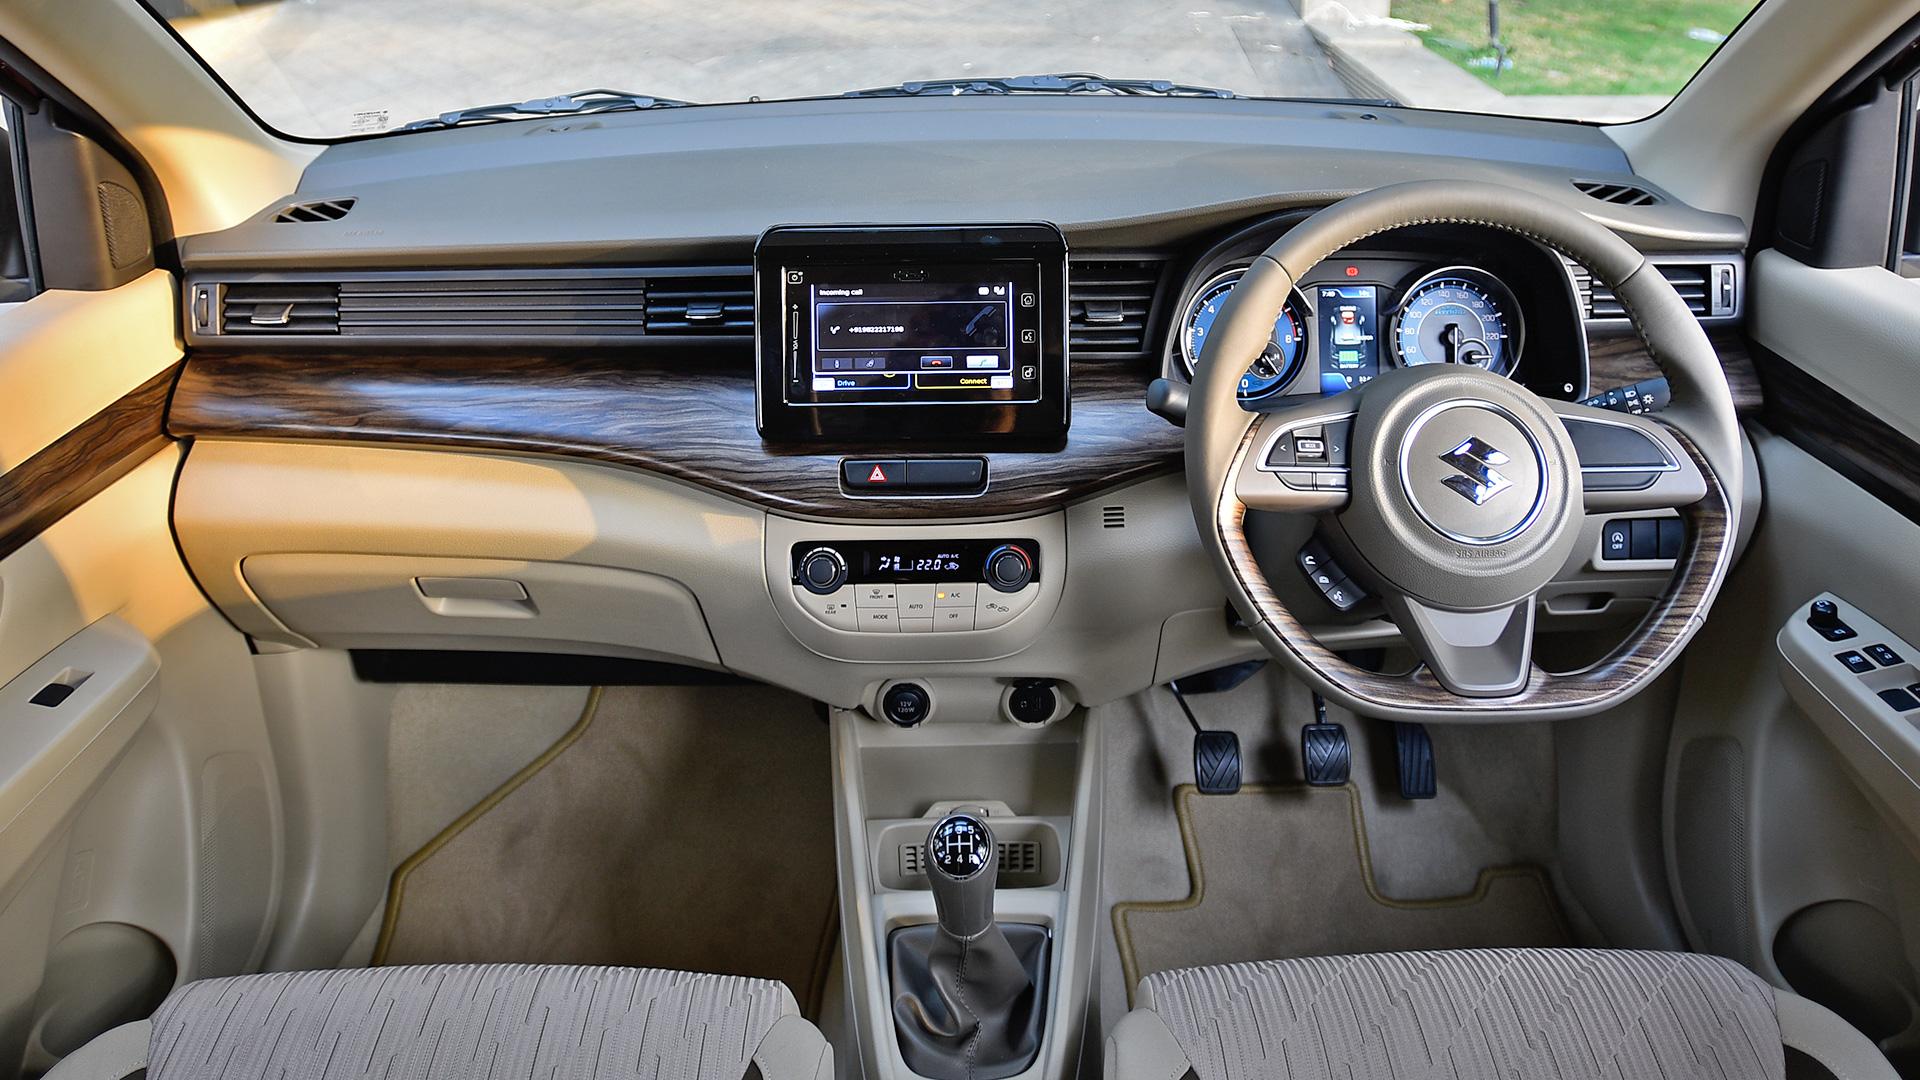 Maruti Suzuki Ertiga 2019 Vdi Price Mileage Reviews